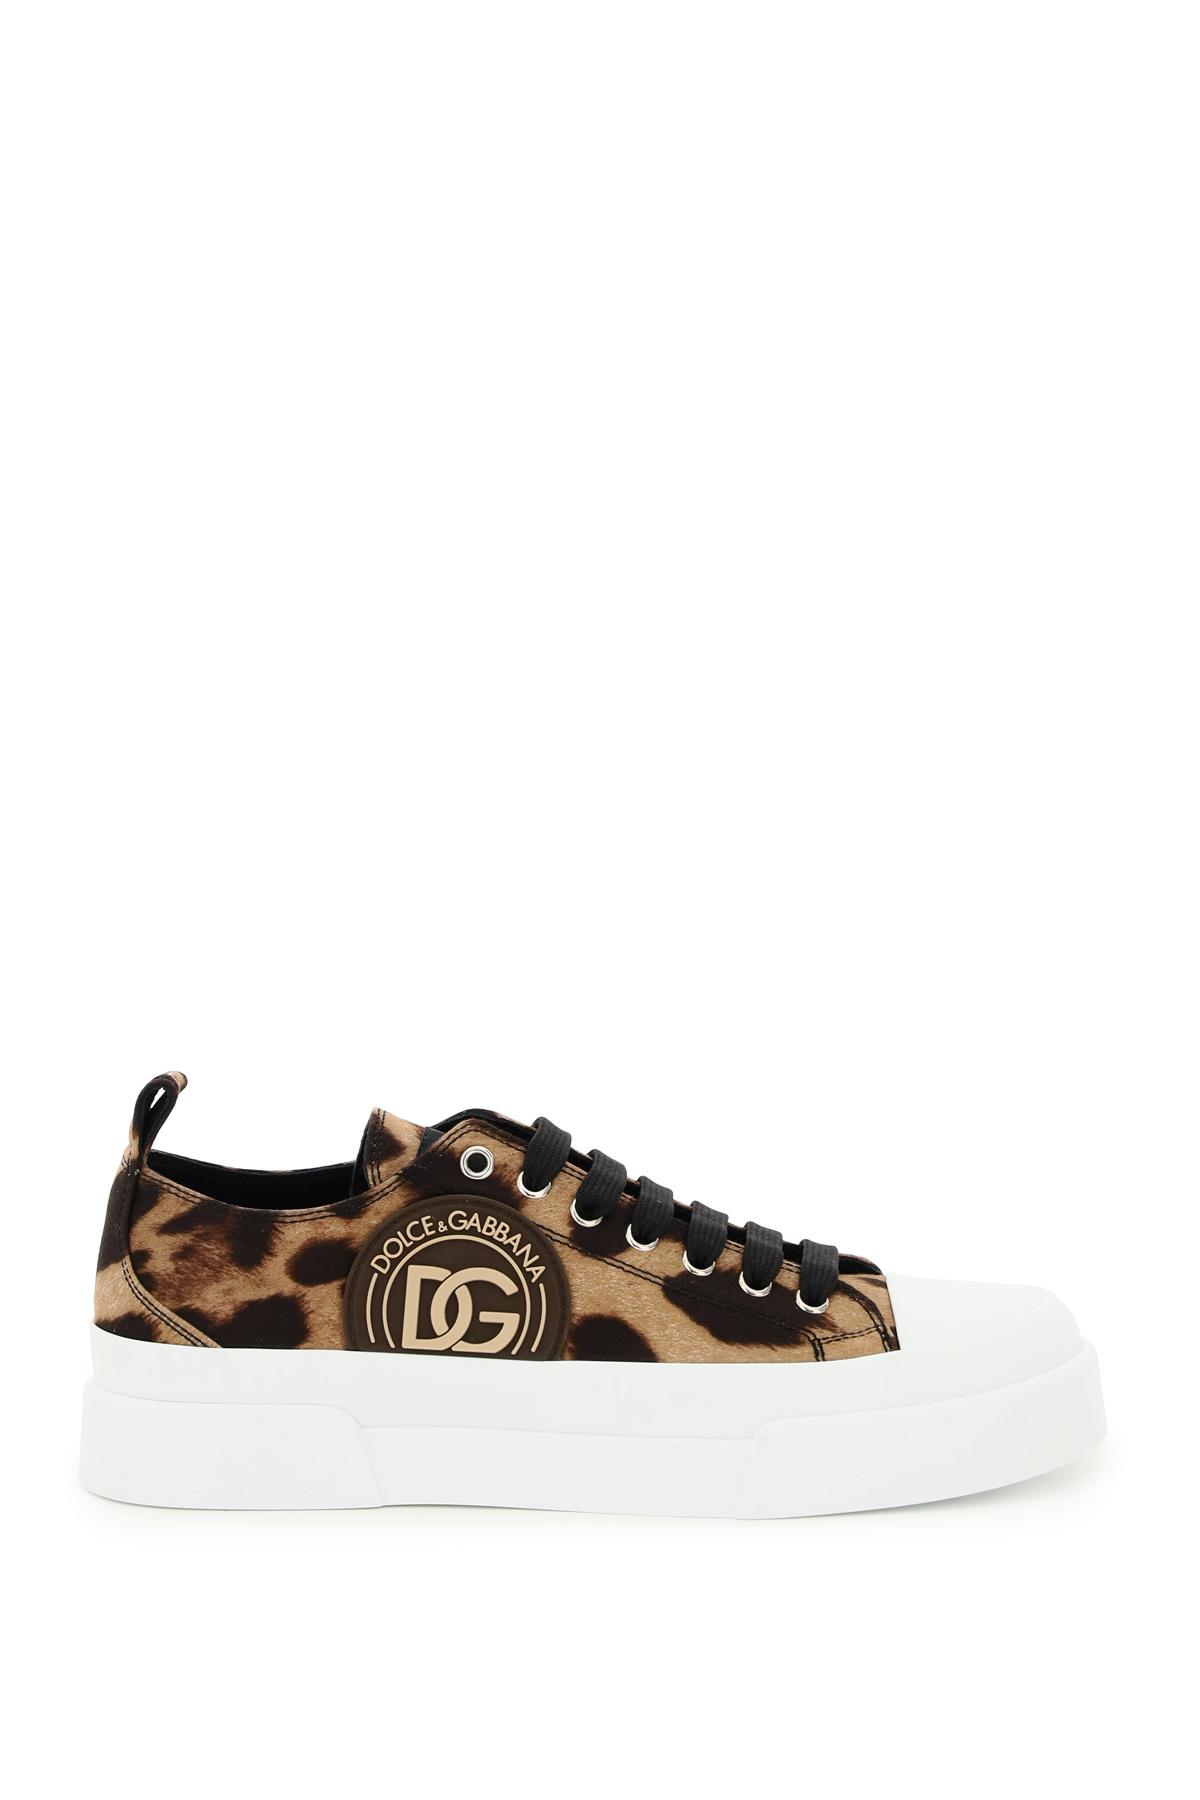 Dolce & gabbana sneakers portofino leopardata